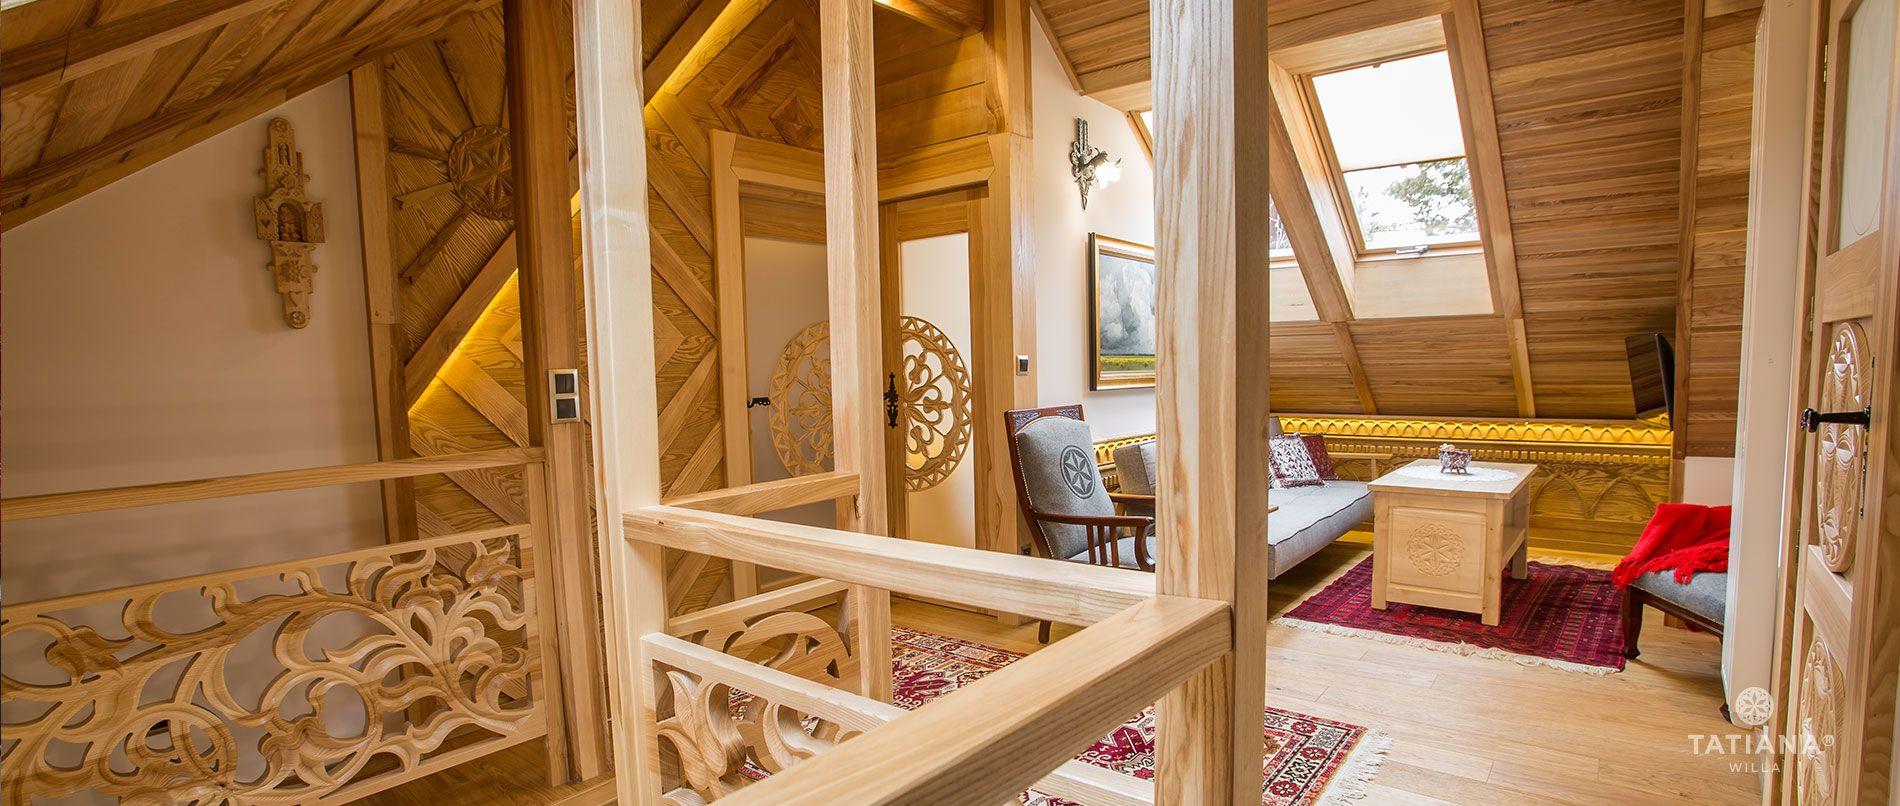 Apartament Tatrzański - salon góra